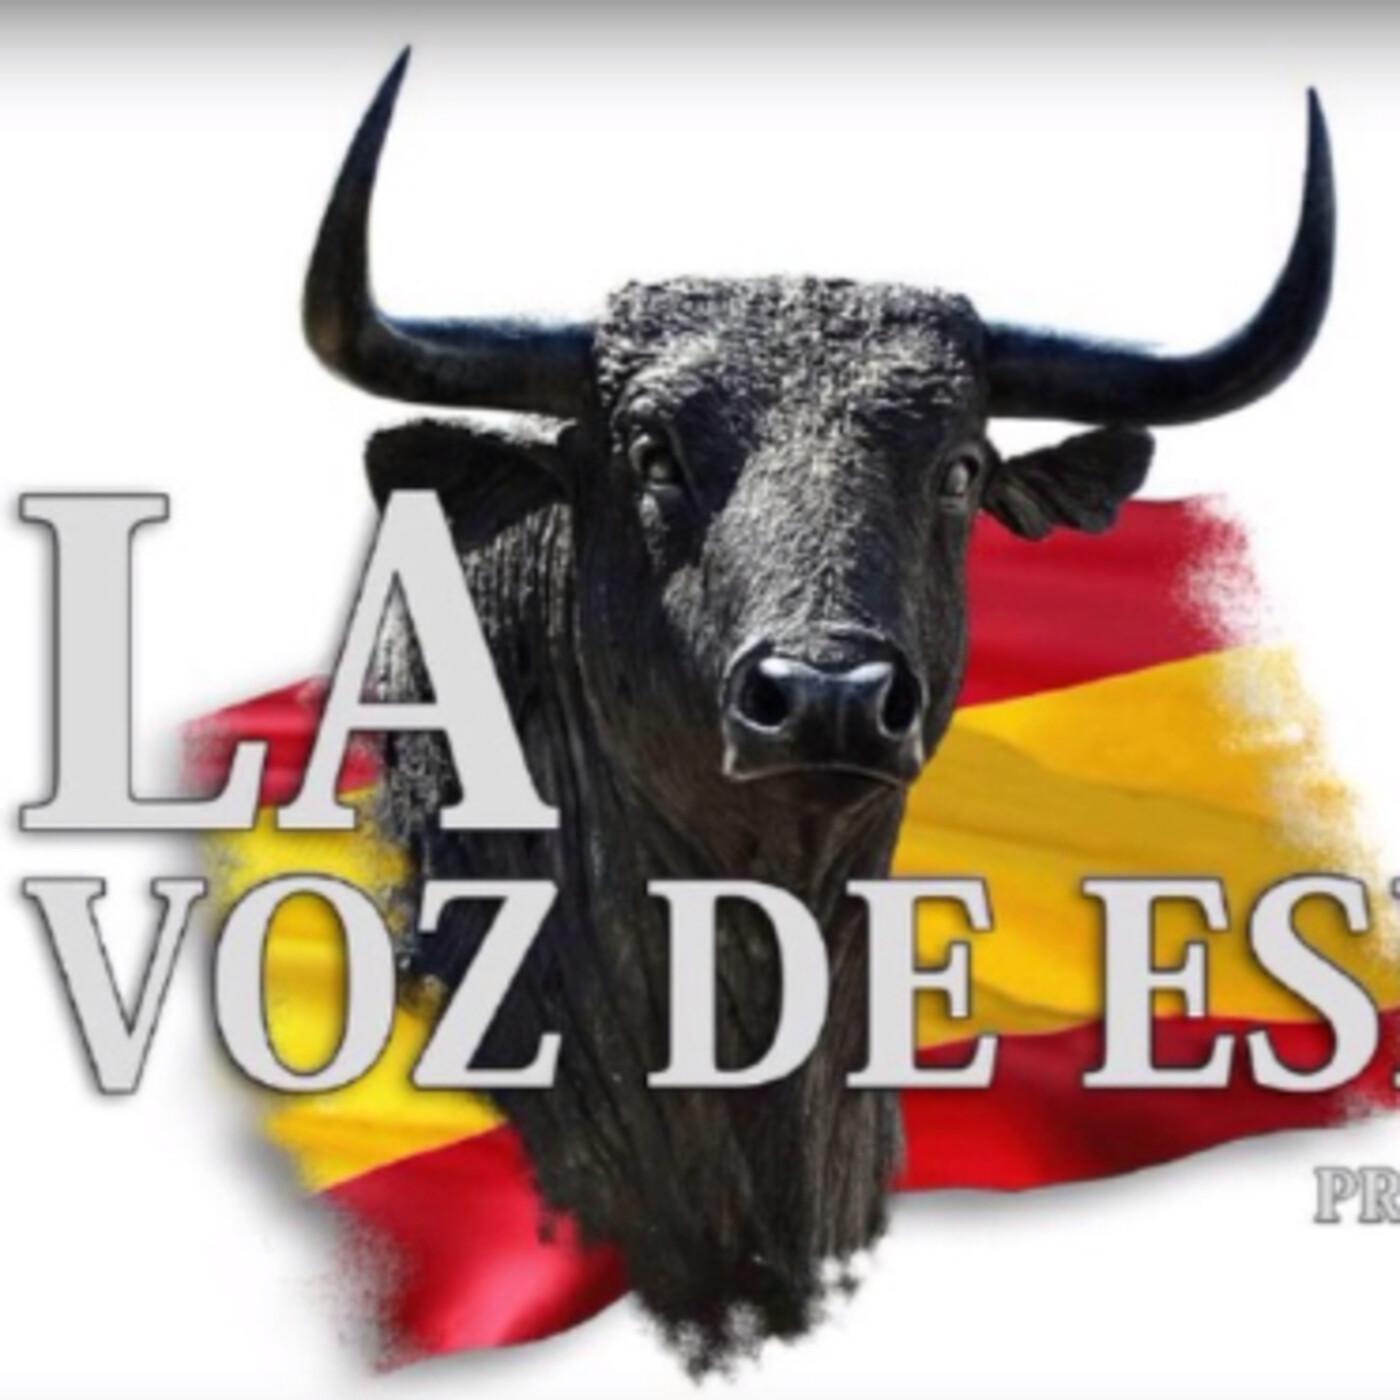 LA VOZ DE ESPAÑA Ed: 242 (09 de Junio)